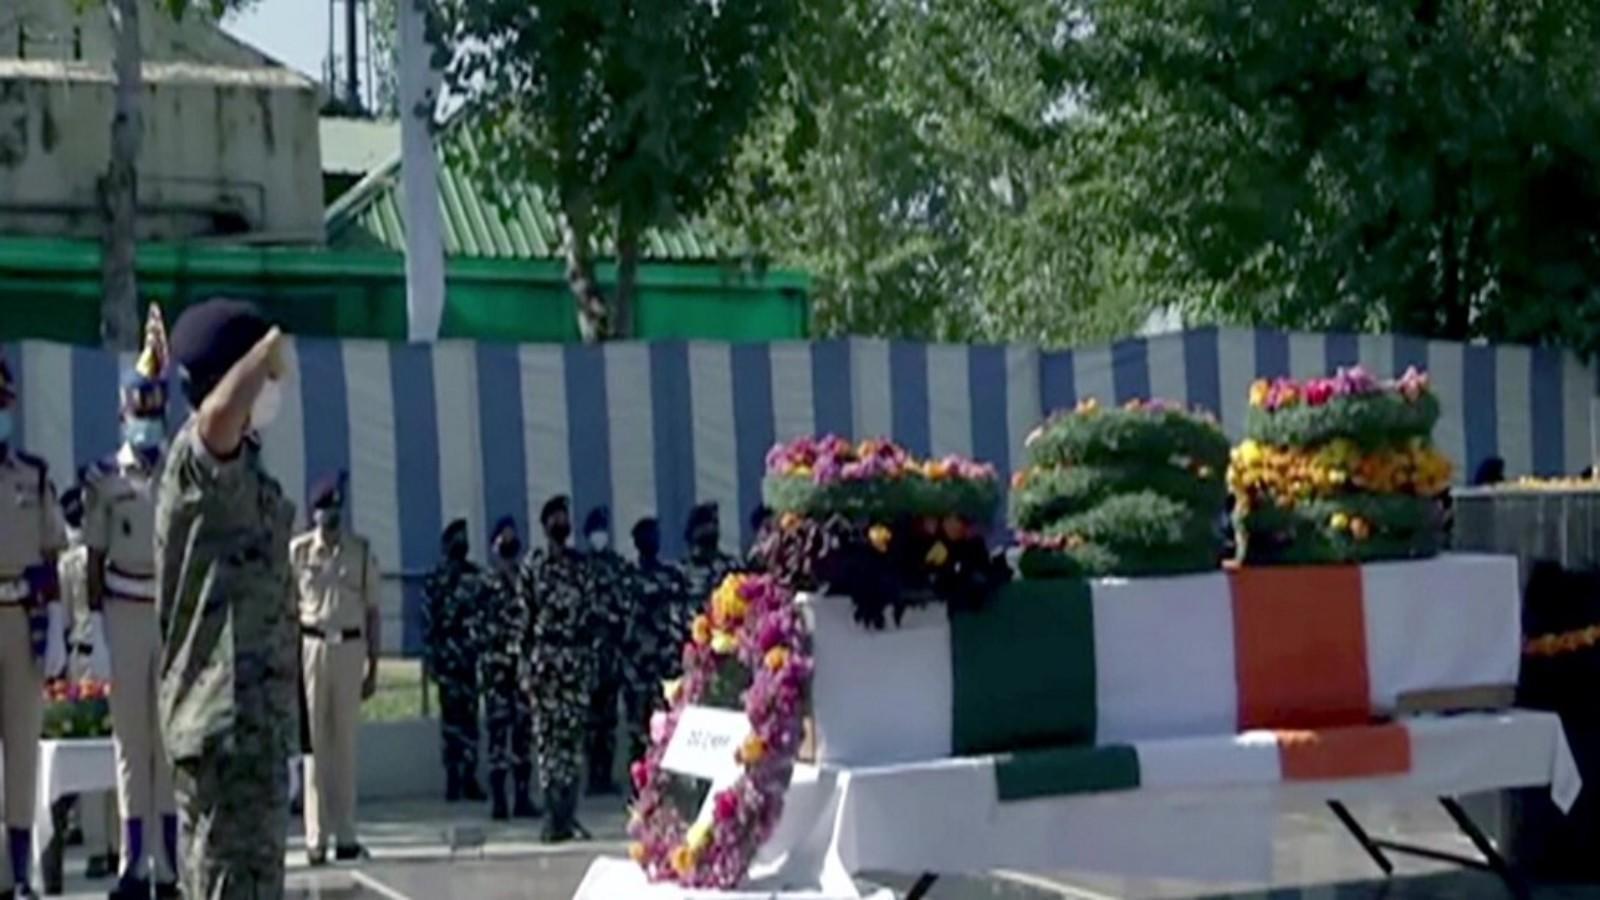 budgam-terrorist-attack-wreath-laying-ceremony-of-crpf-jawan-held-in-srinagar